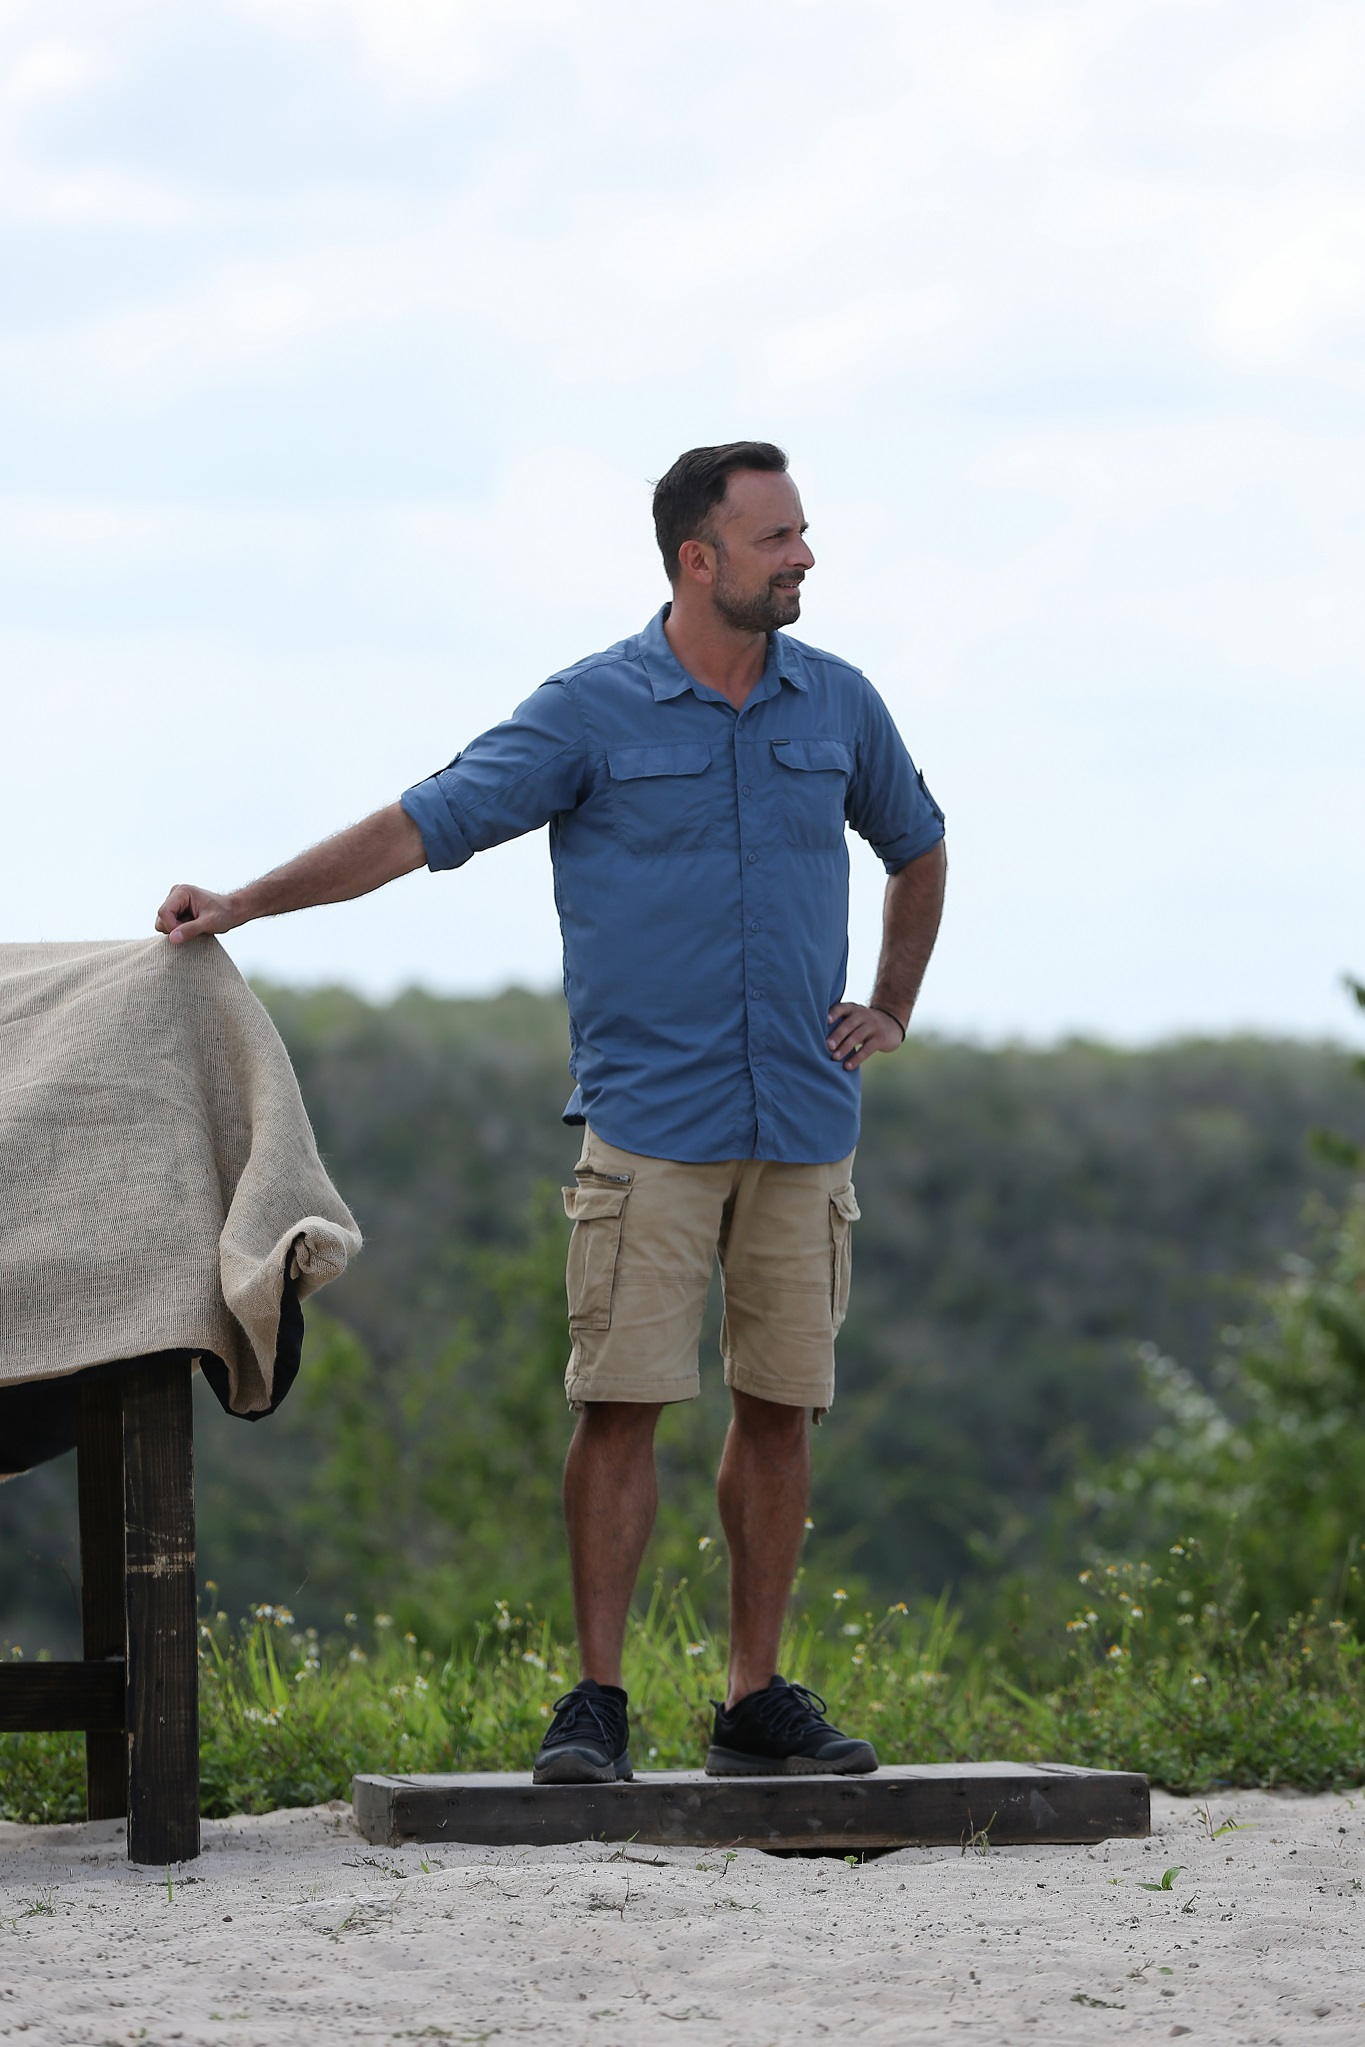 Survivor: Το σχέδιο Παππά -Γιατί ζητησε να αντιμετωπίσει τον Τζέιμς (vid)